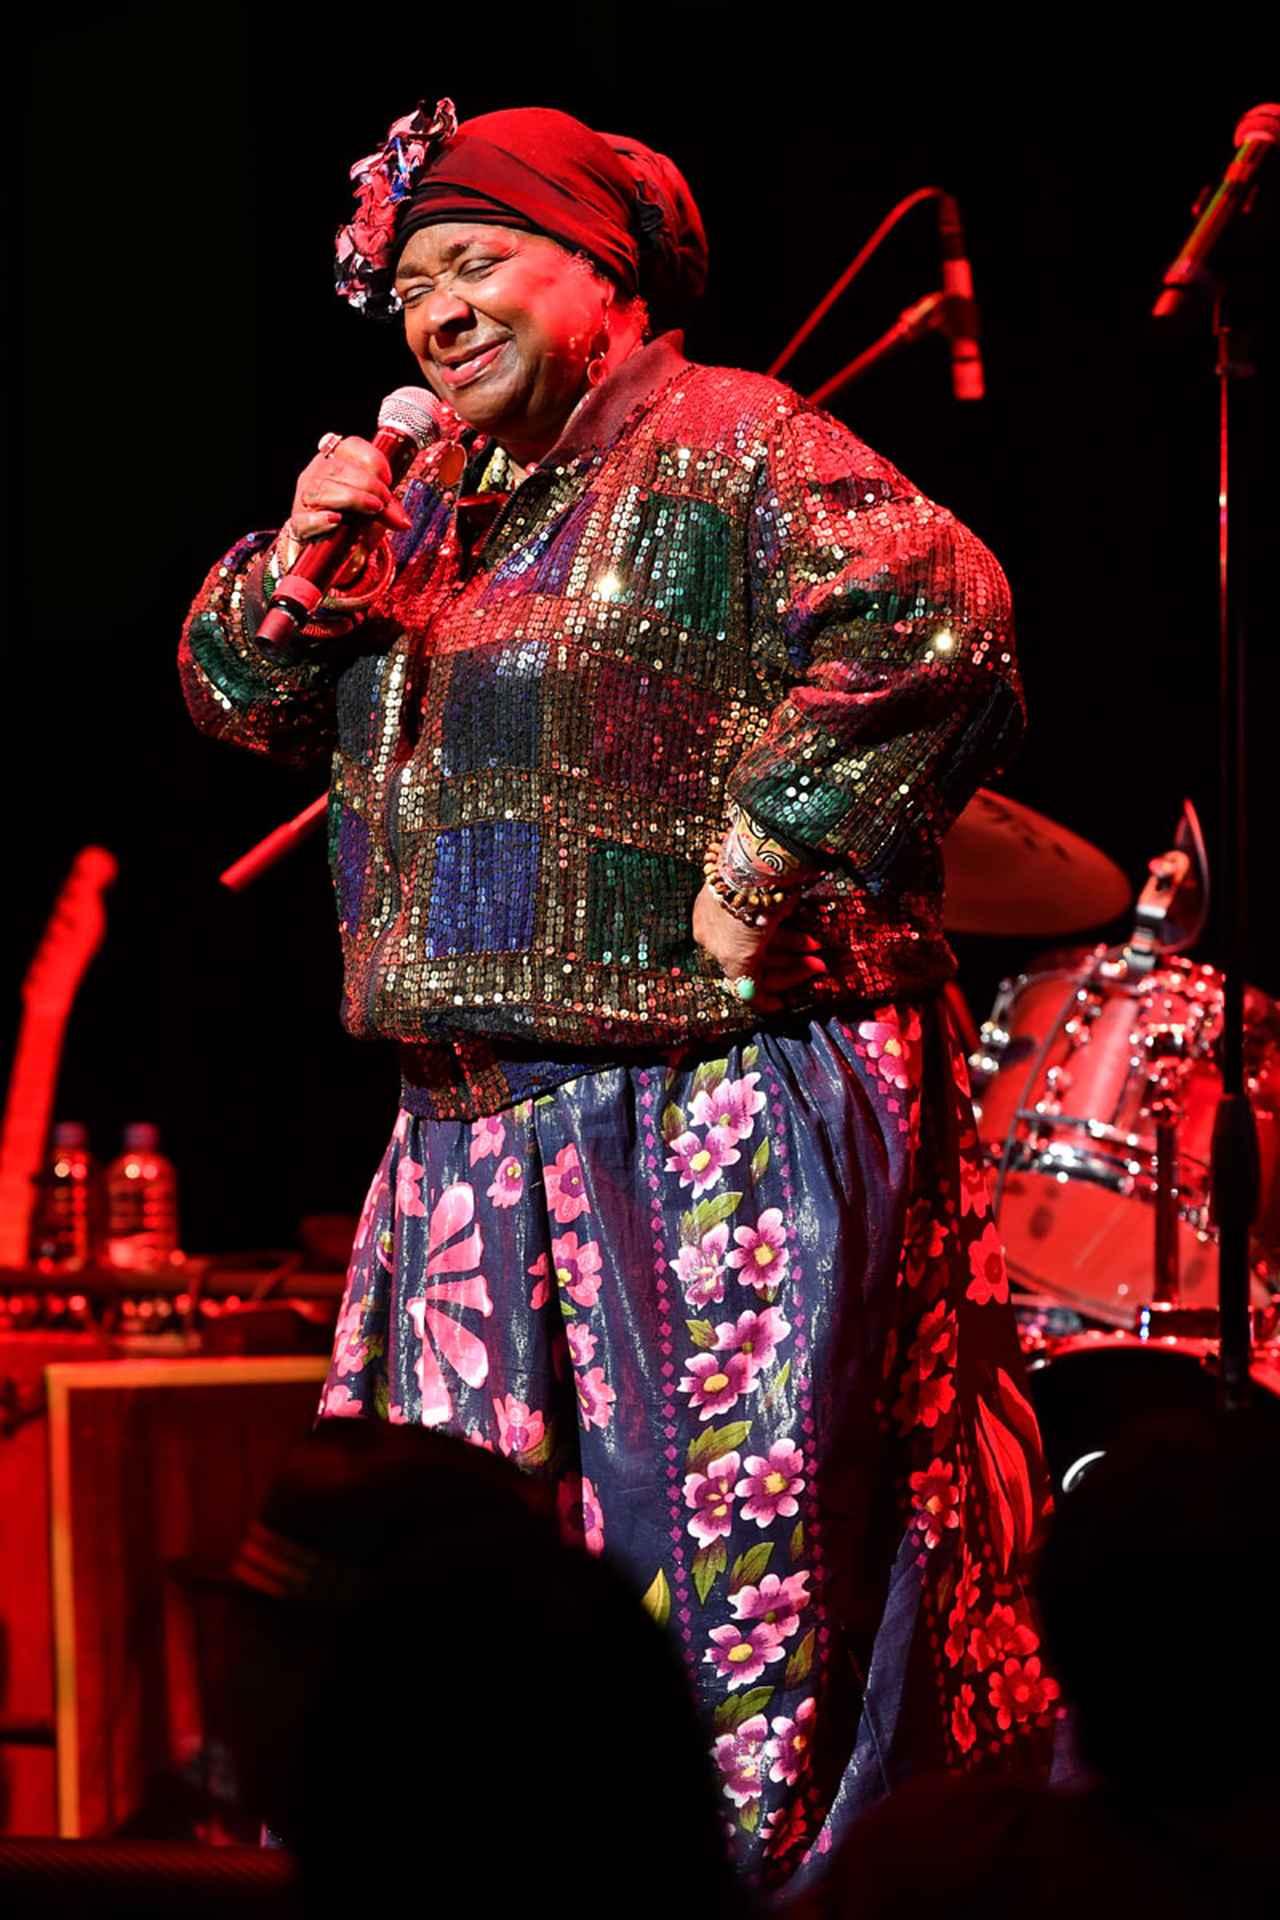 "Images : 12番目の画像 - 「カーラ・トーマス&ザ・メンフィス・オールスター・レビュー 60年代メンフィス・ソウルを代表する""クイーン""が、最高峰のメンバーと共に来日」のアルバム - Stereo Sound ONLINE"